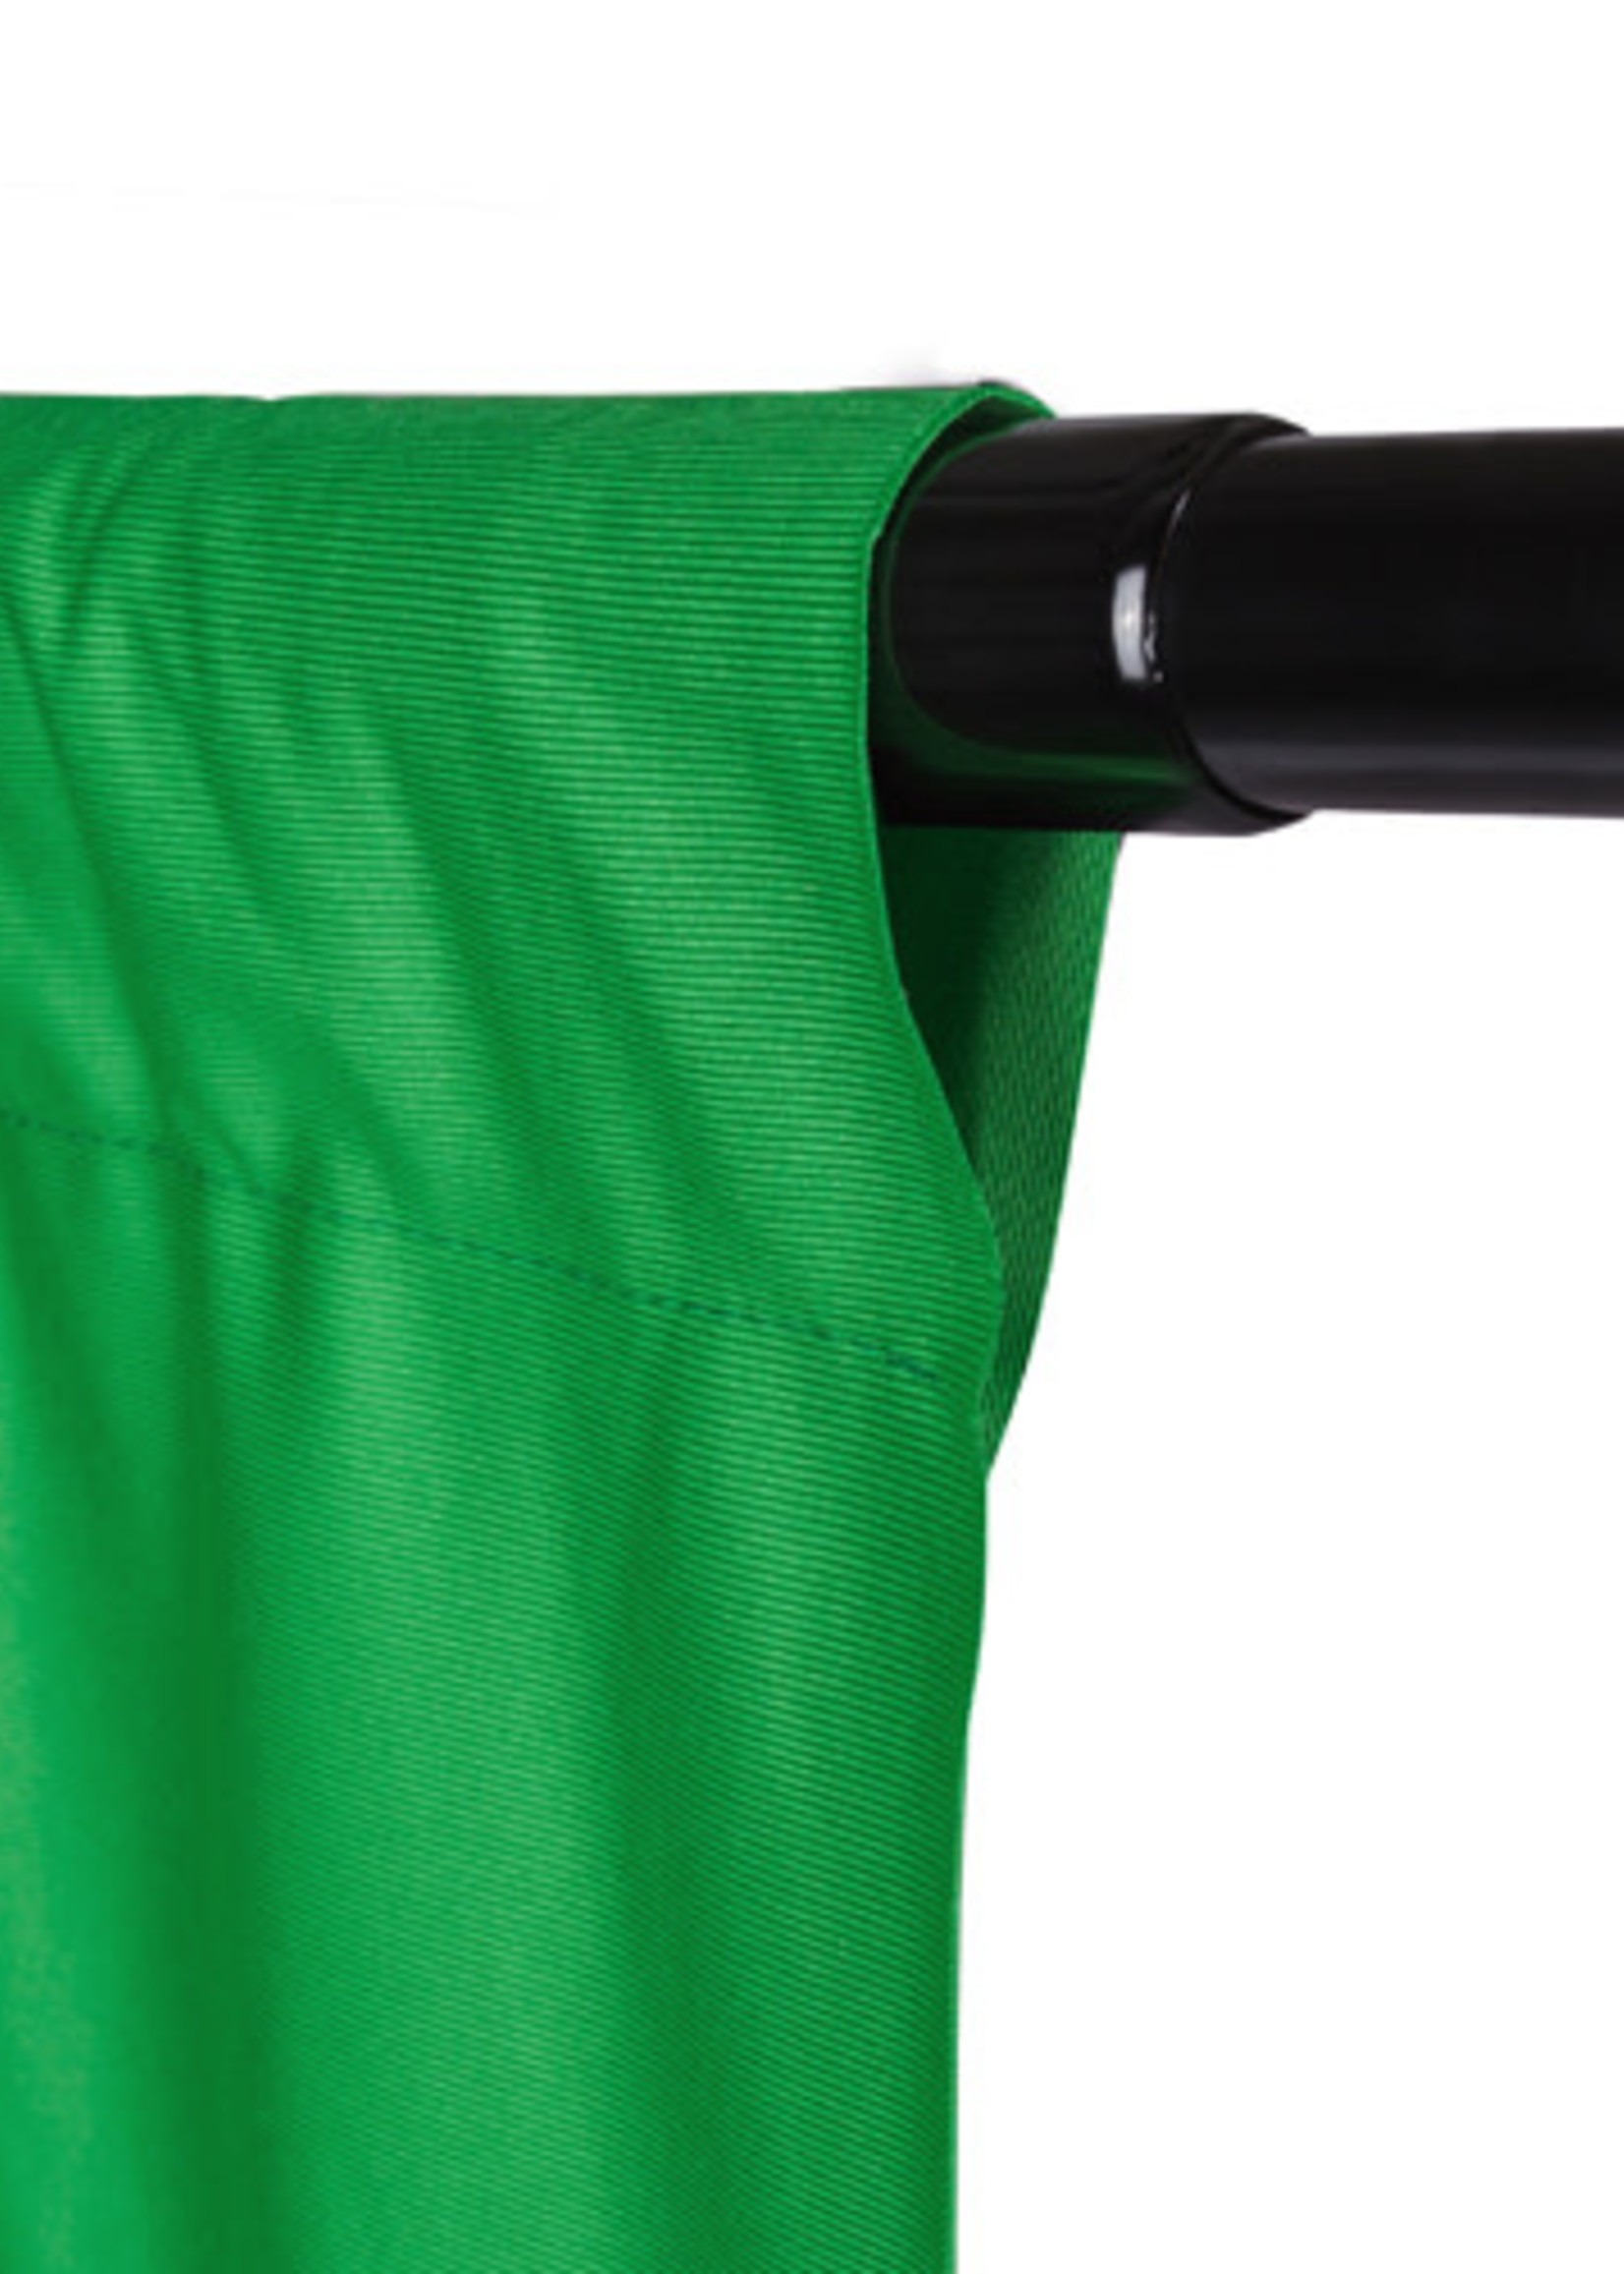 ProMaster ProMaster - Wrinkle Resistant Back Drop 10'X12' - CHROMA-KEY GREEN